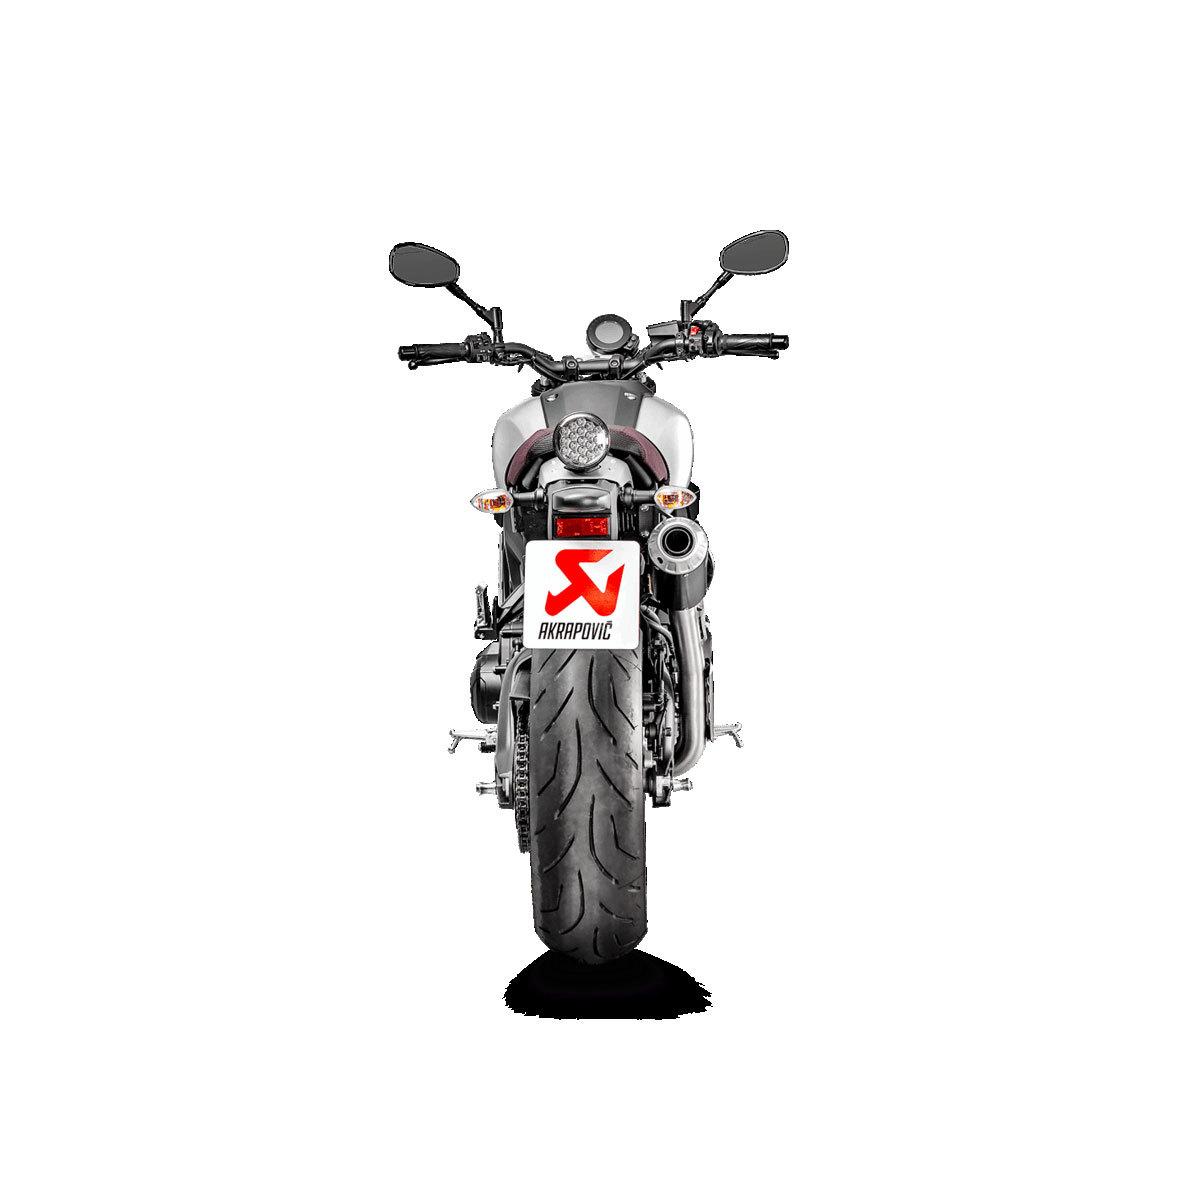 Akrapovic Racing Full Exhaust System - High Mount Muffler 16-18 Yamaha XSR 900